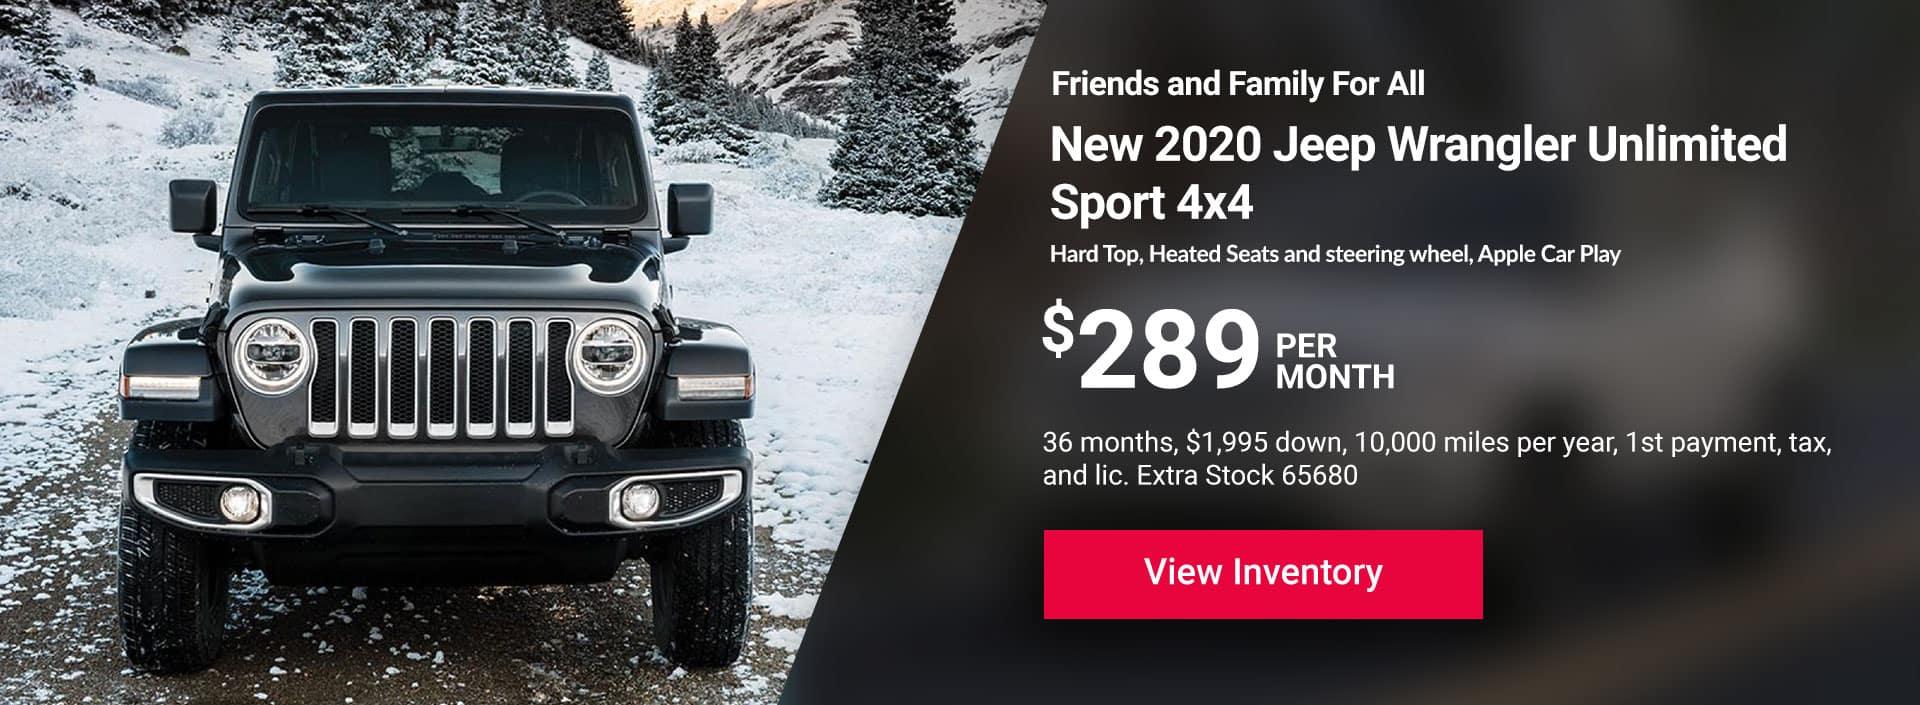 2020 Jeep Wrangler Unlimited Sport 4x4